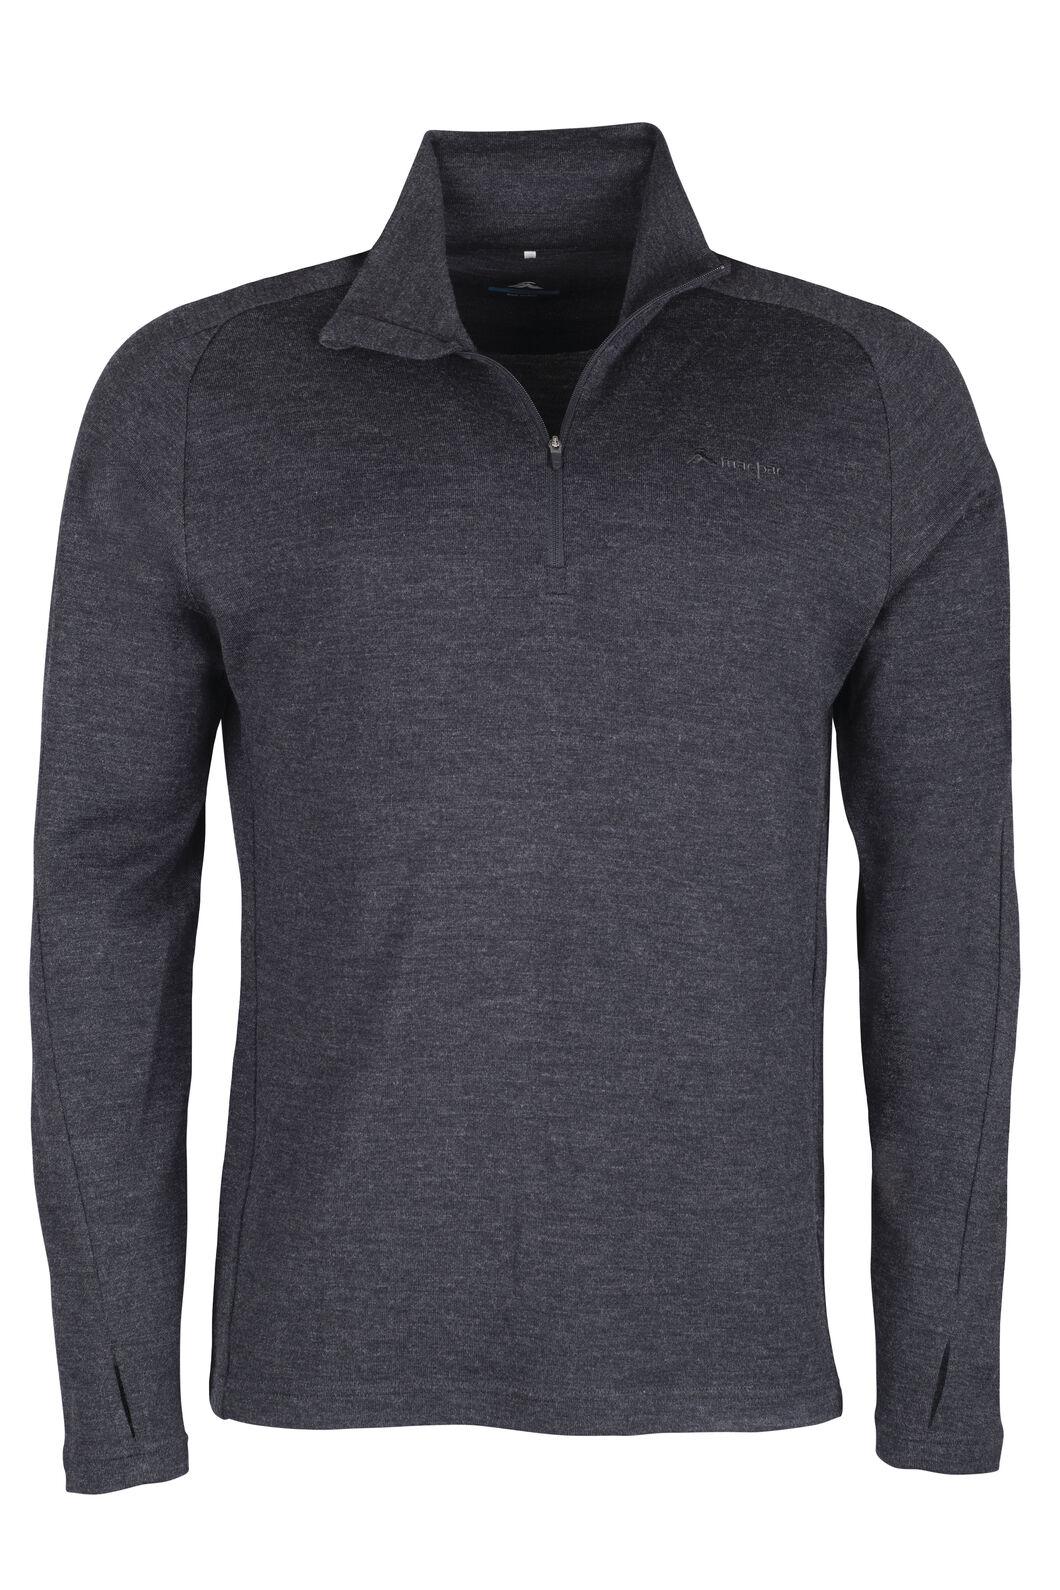 Macpac Kauri 280 Merino Pullover - Men's, Charcoal Marle, hi-res